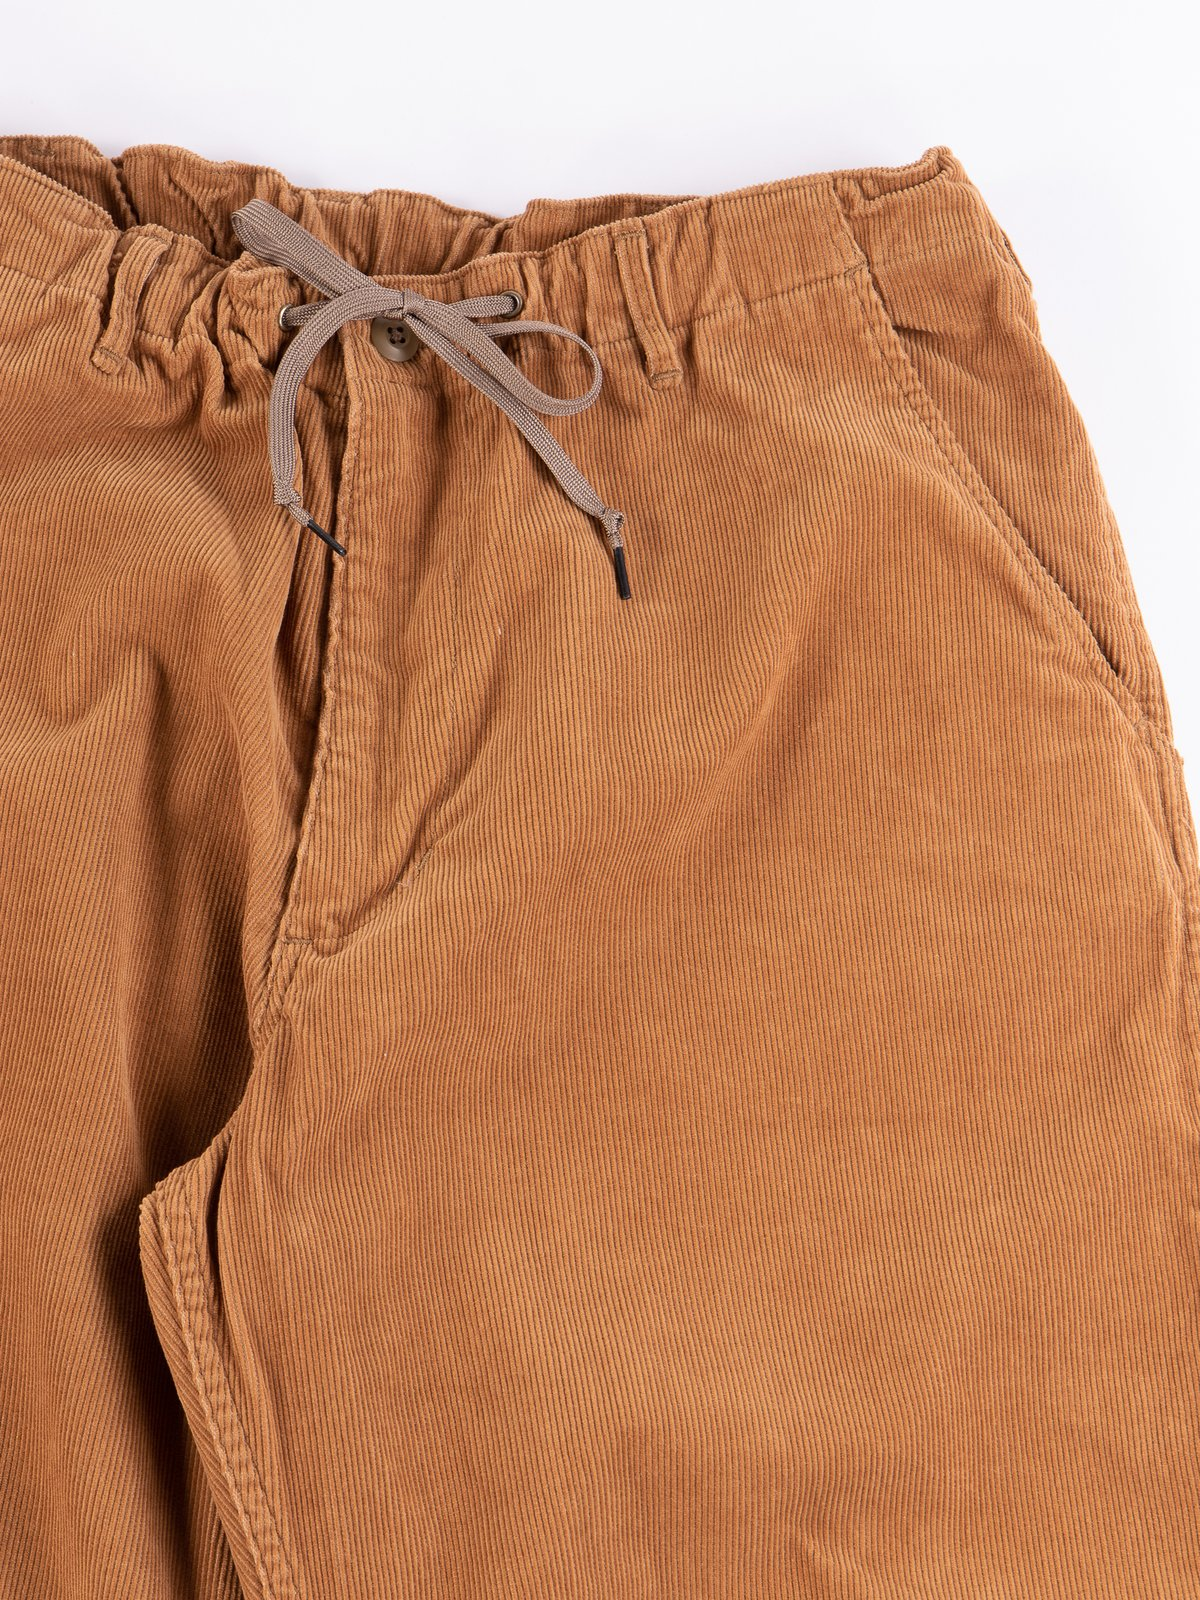 Brown Cord TBB Service Pant - Image 4